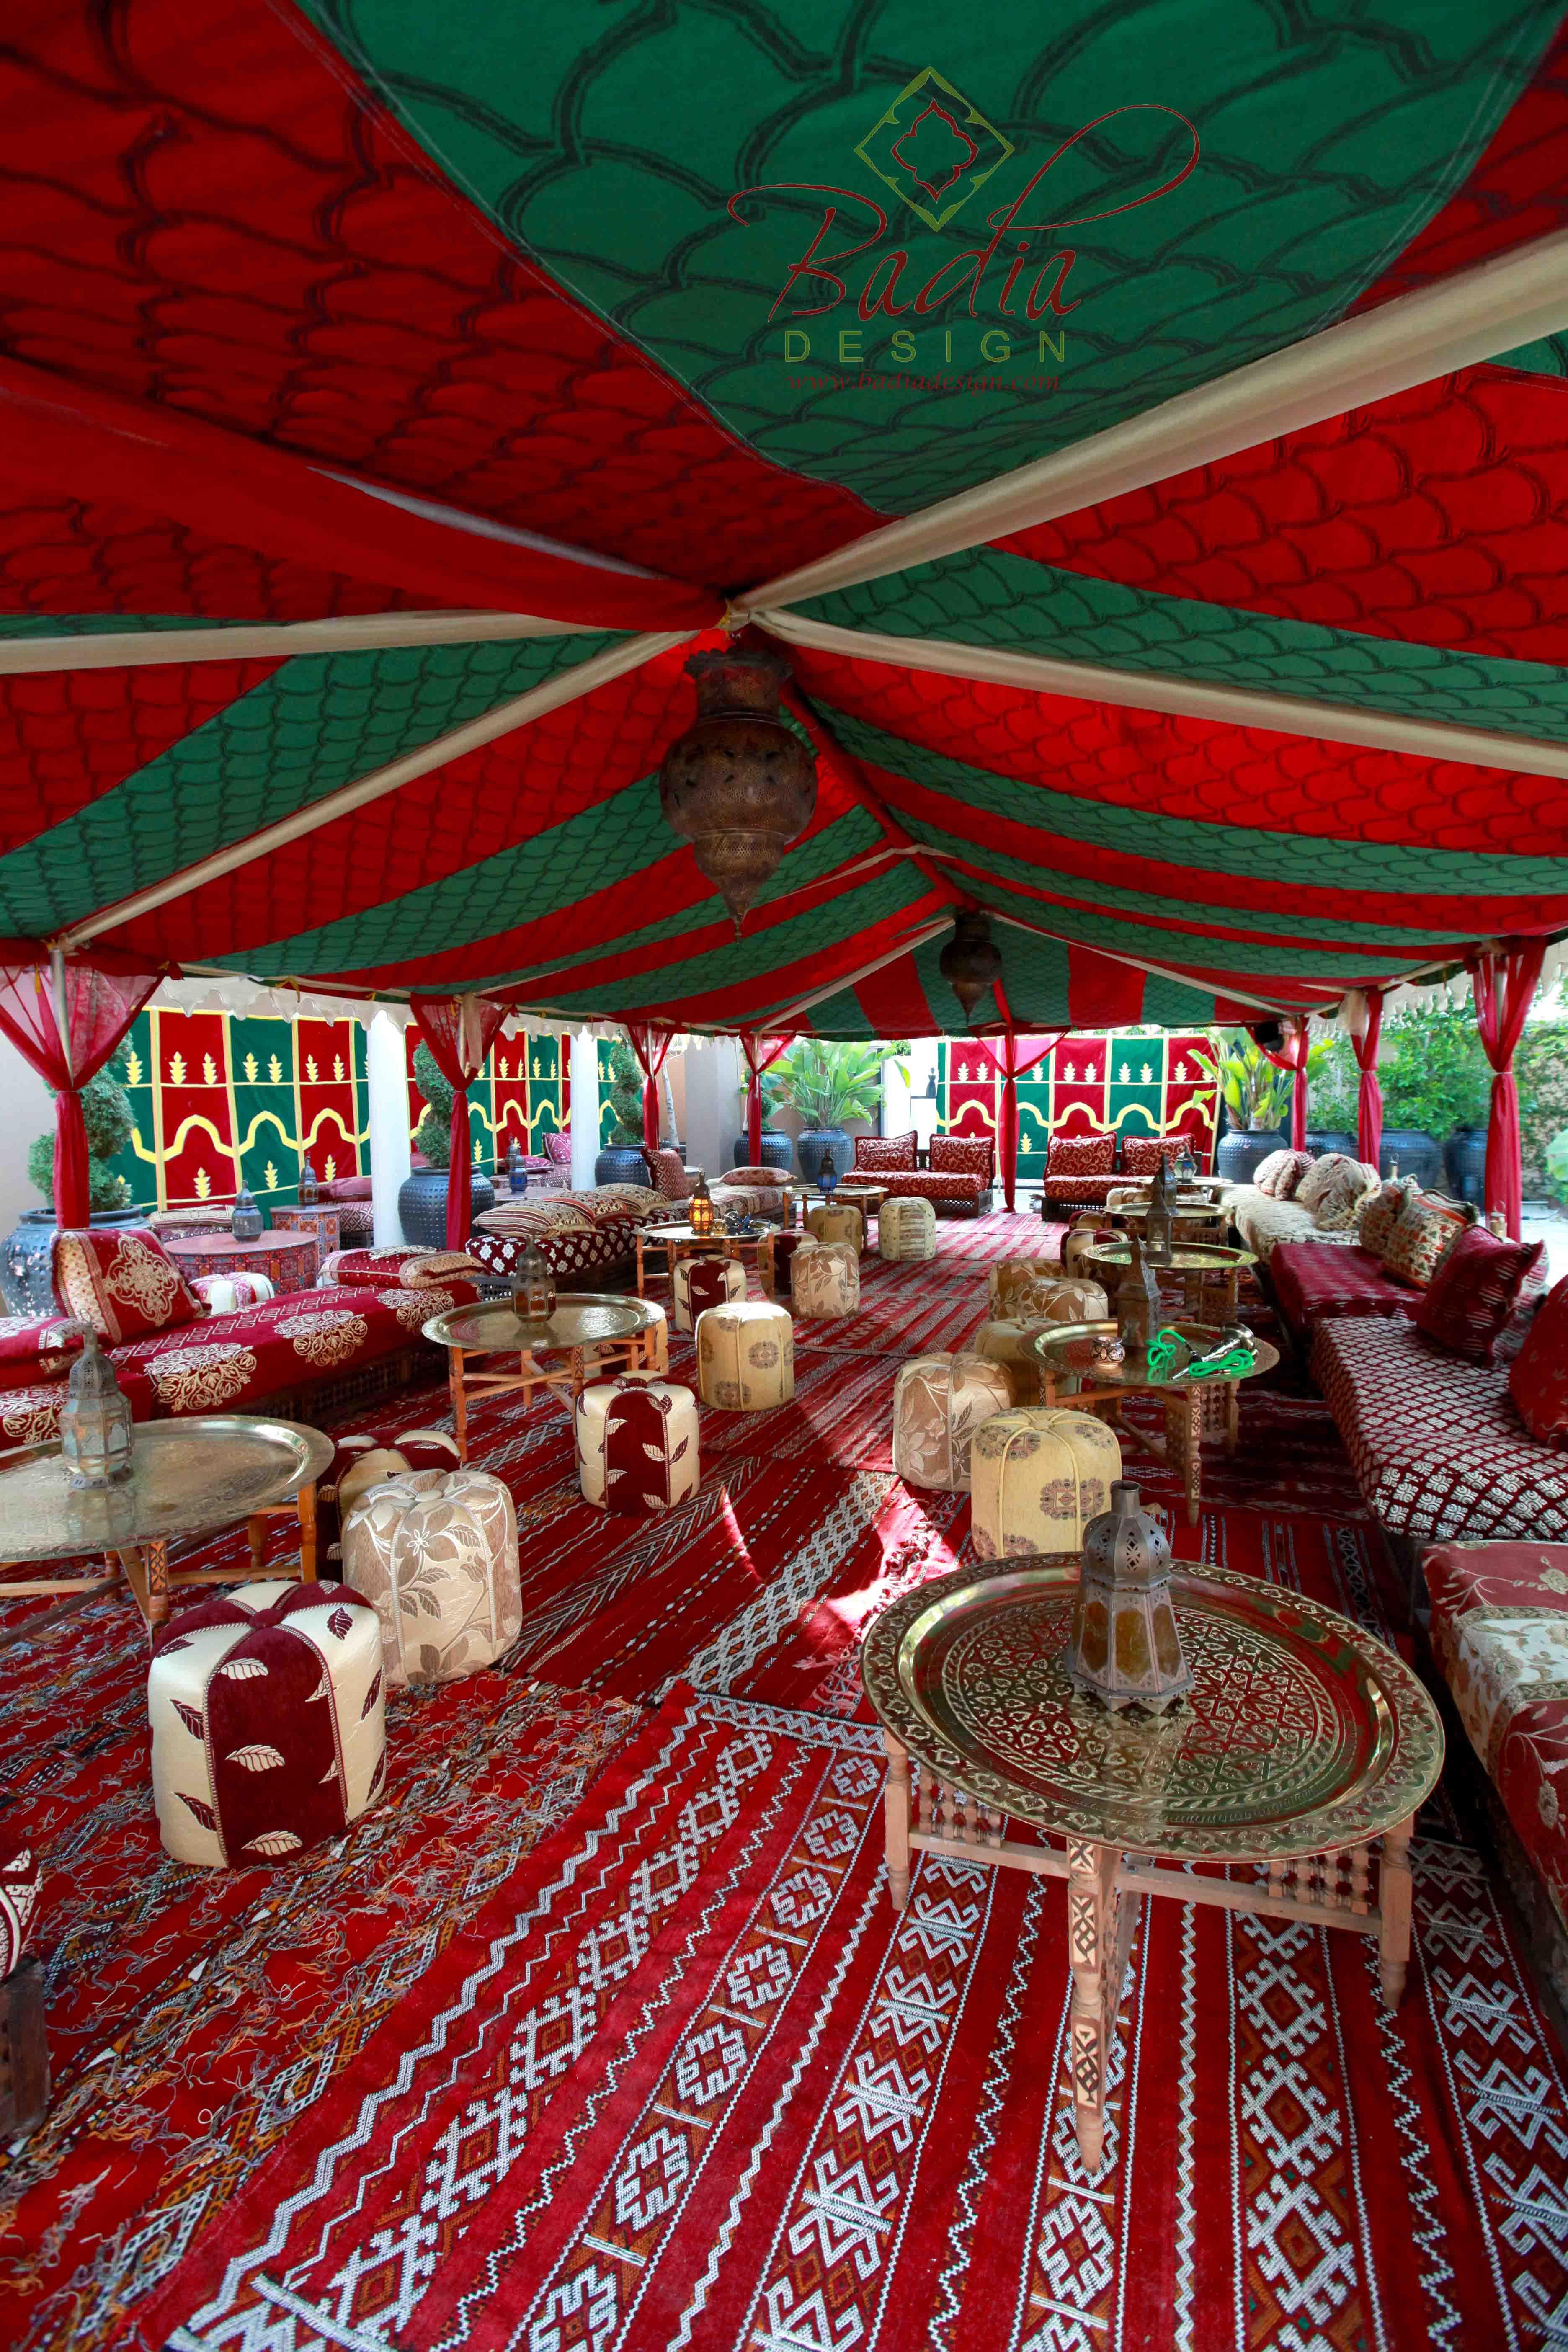 Moroccan Tent Rentals Los Angeles from Badia Design Inc.